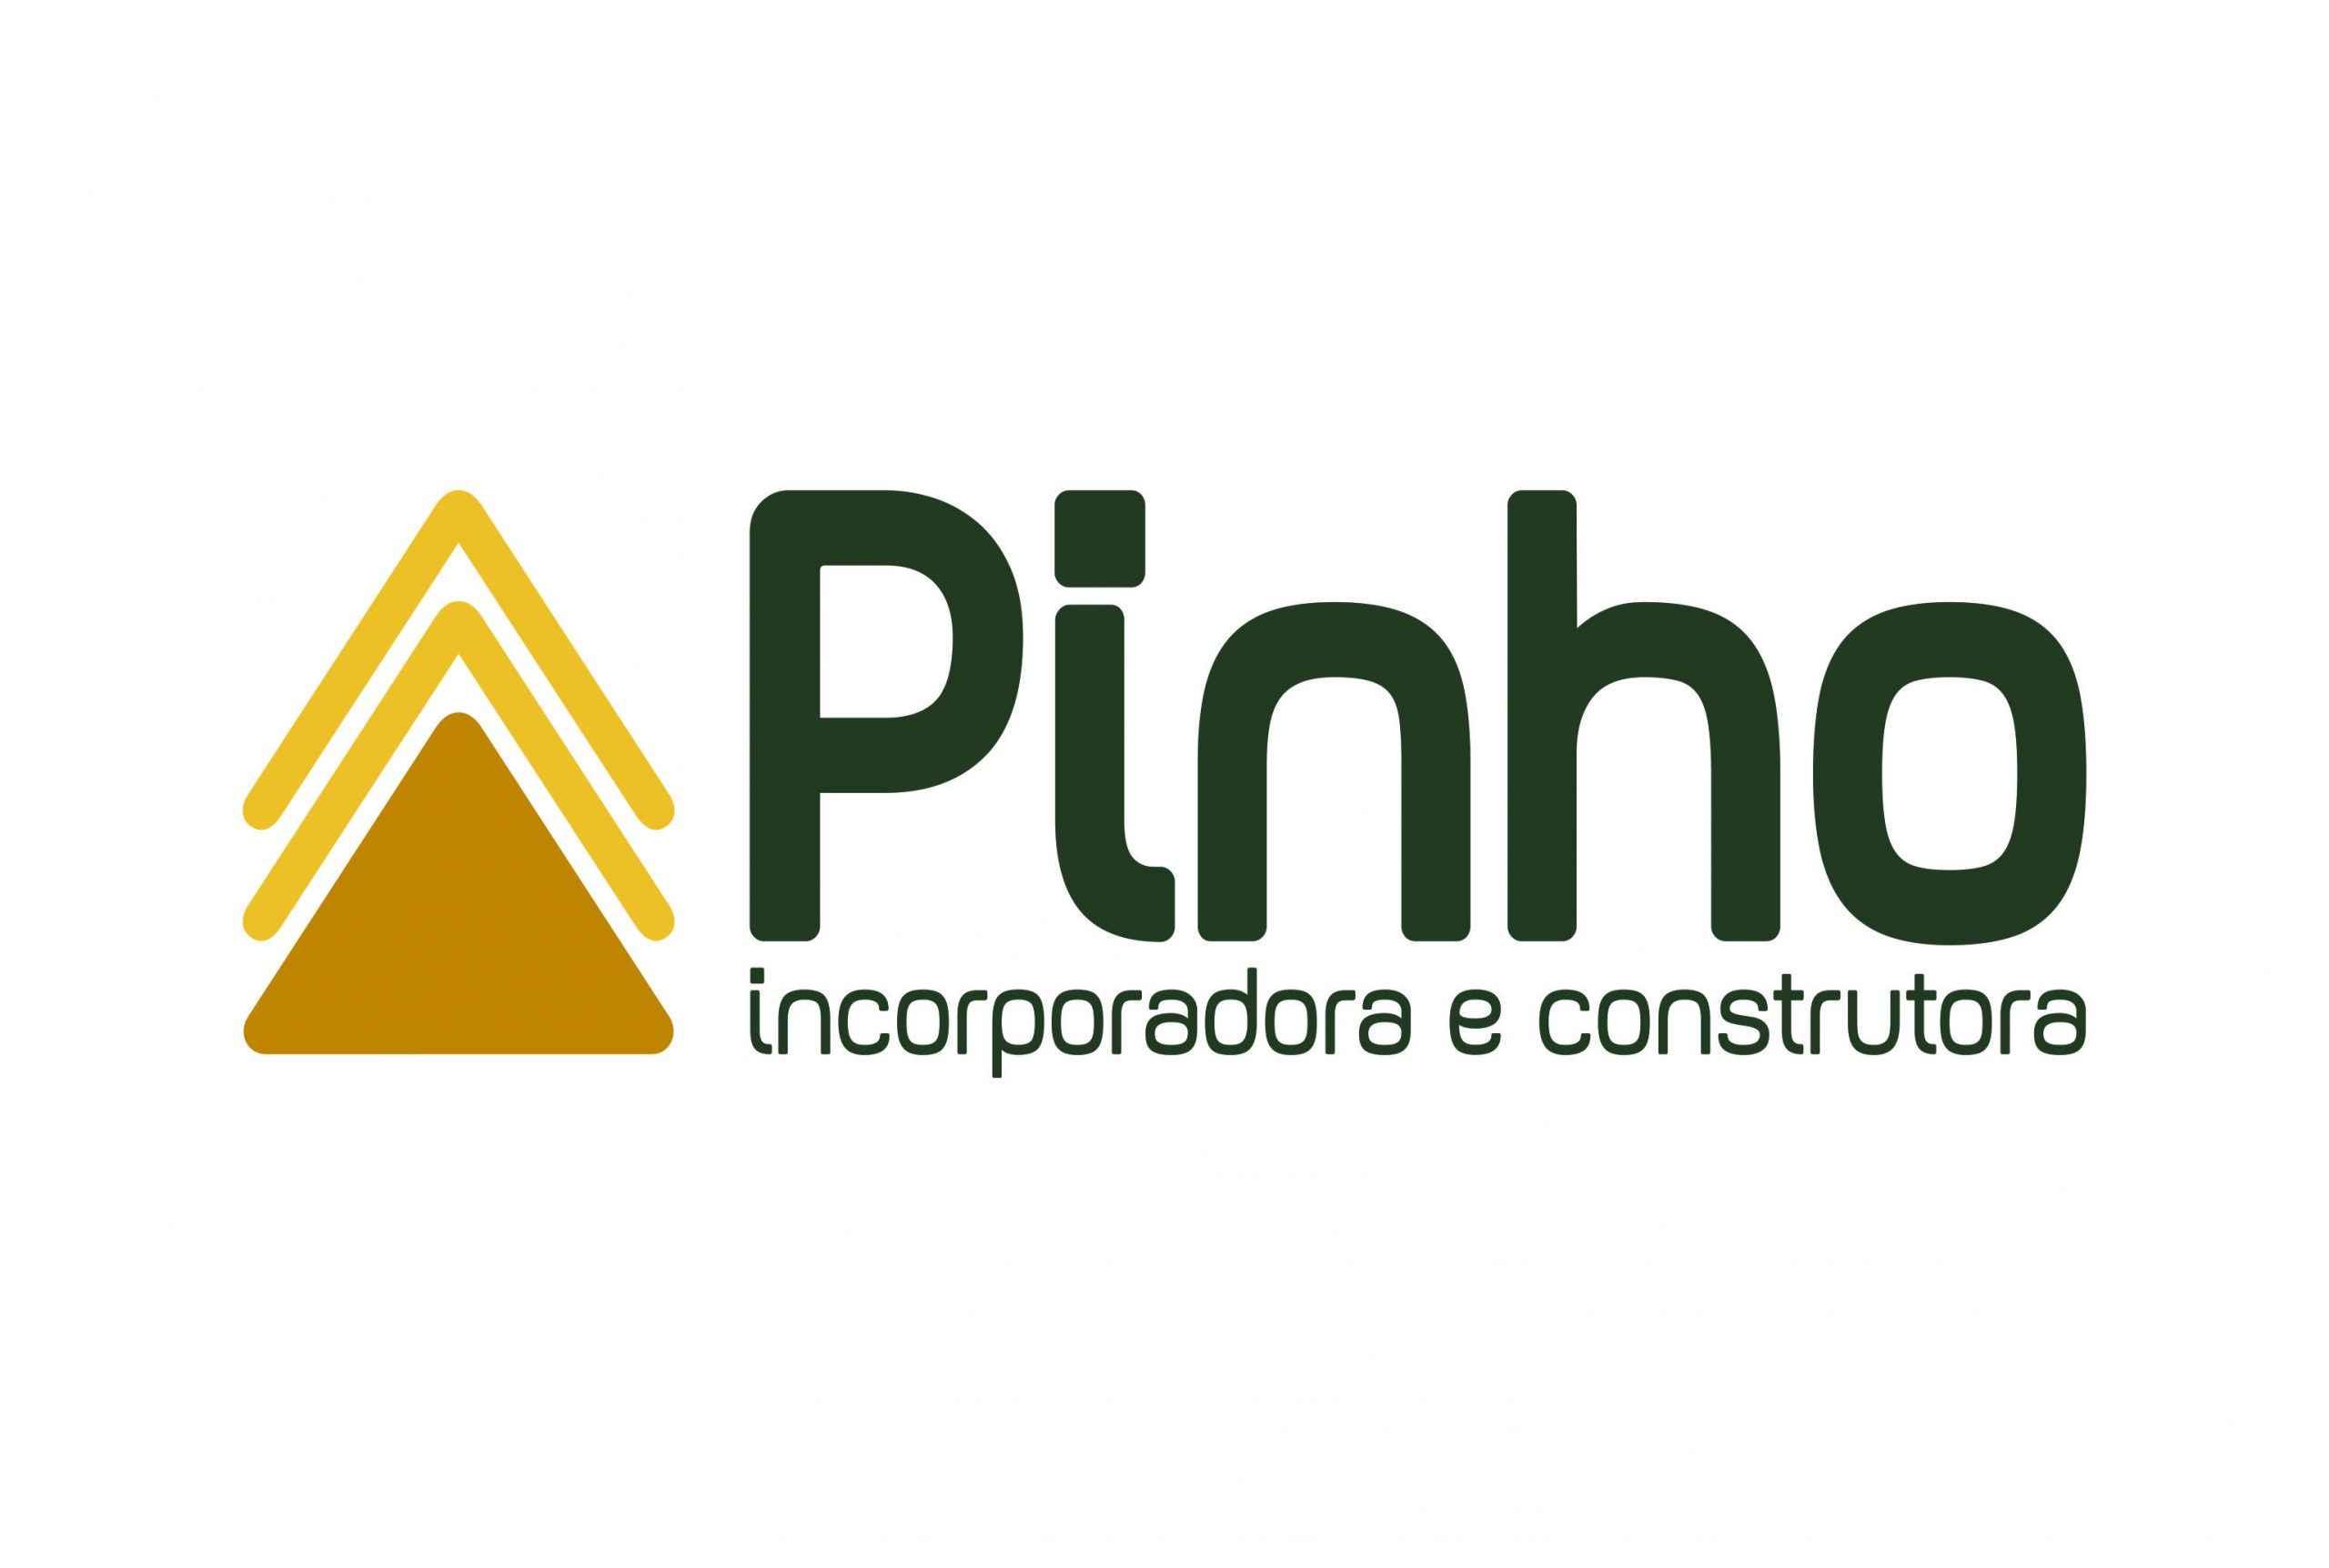 https://www.pinhoconstrutora.com.br/